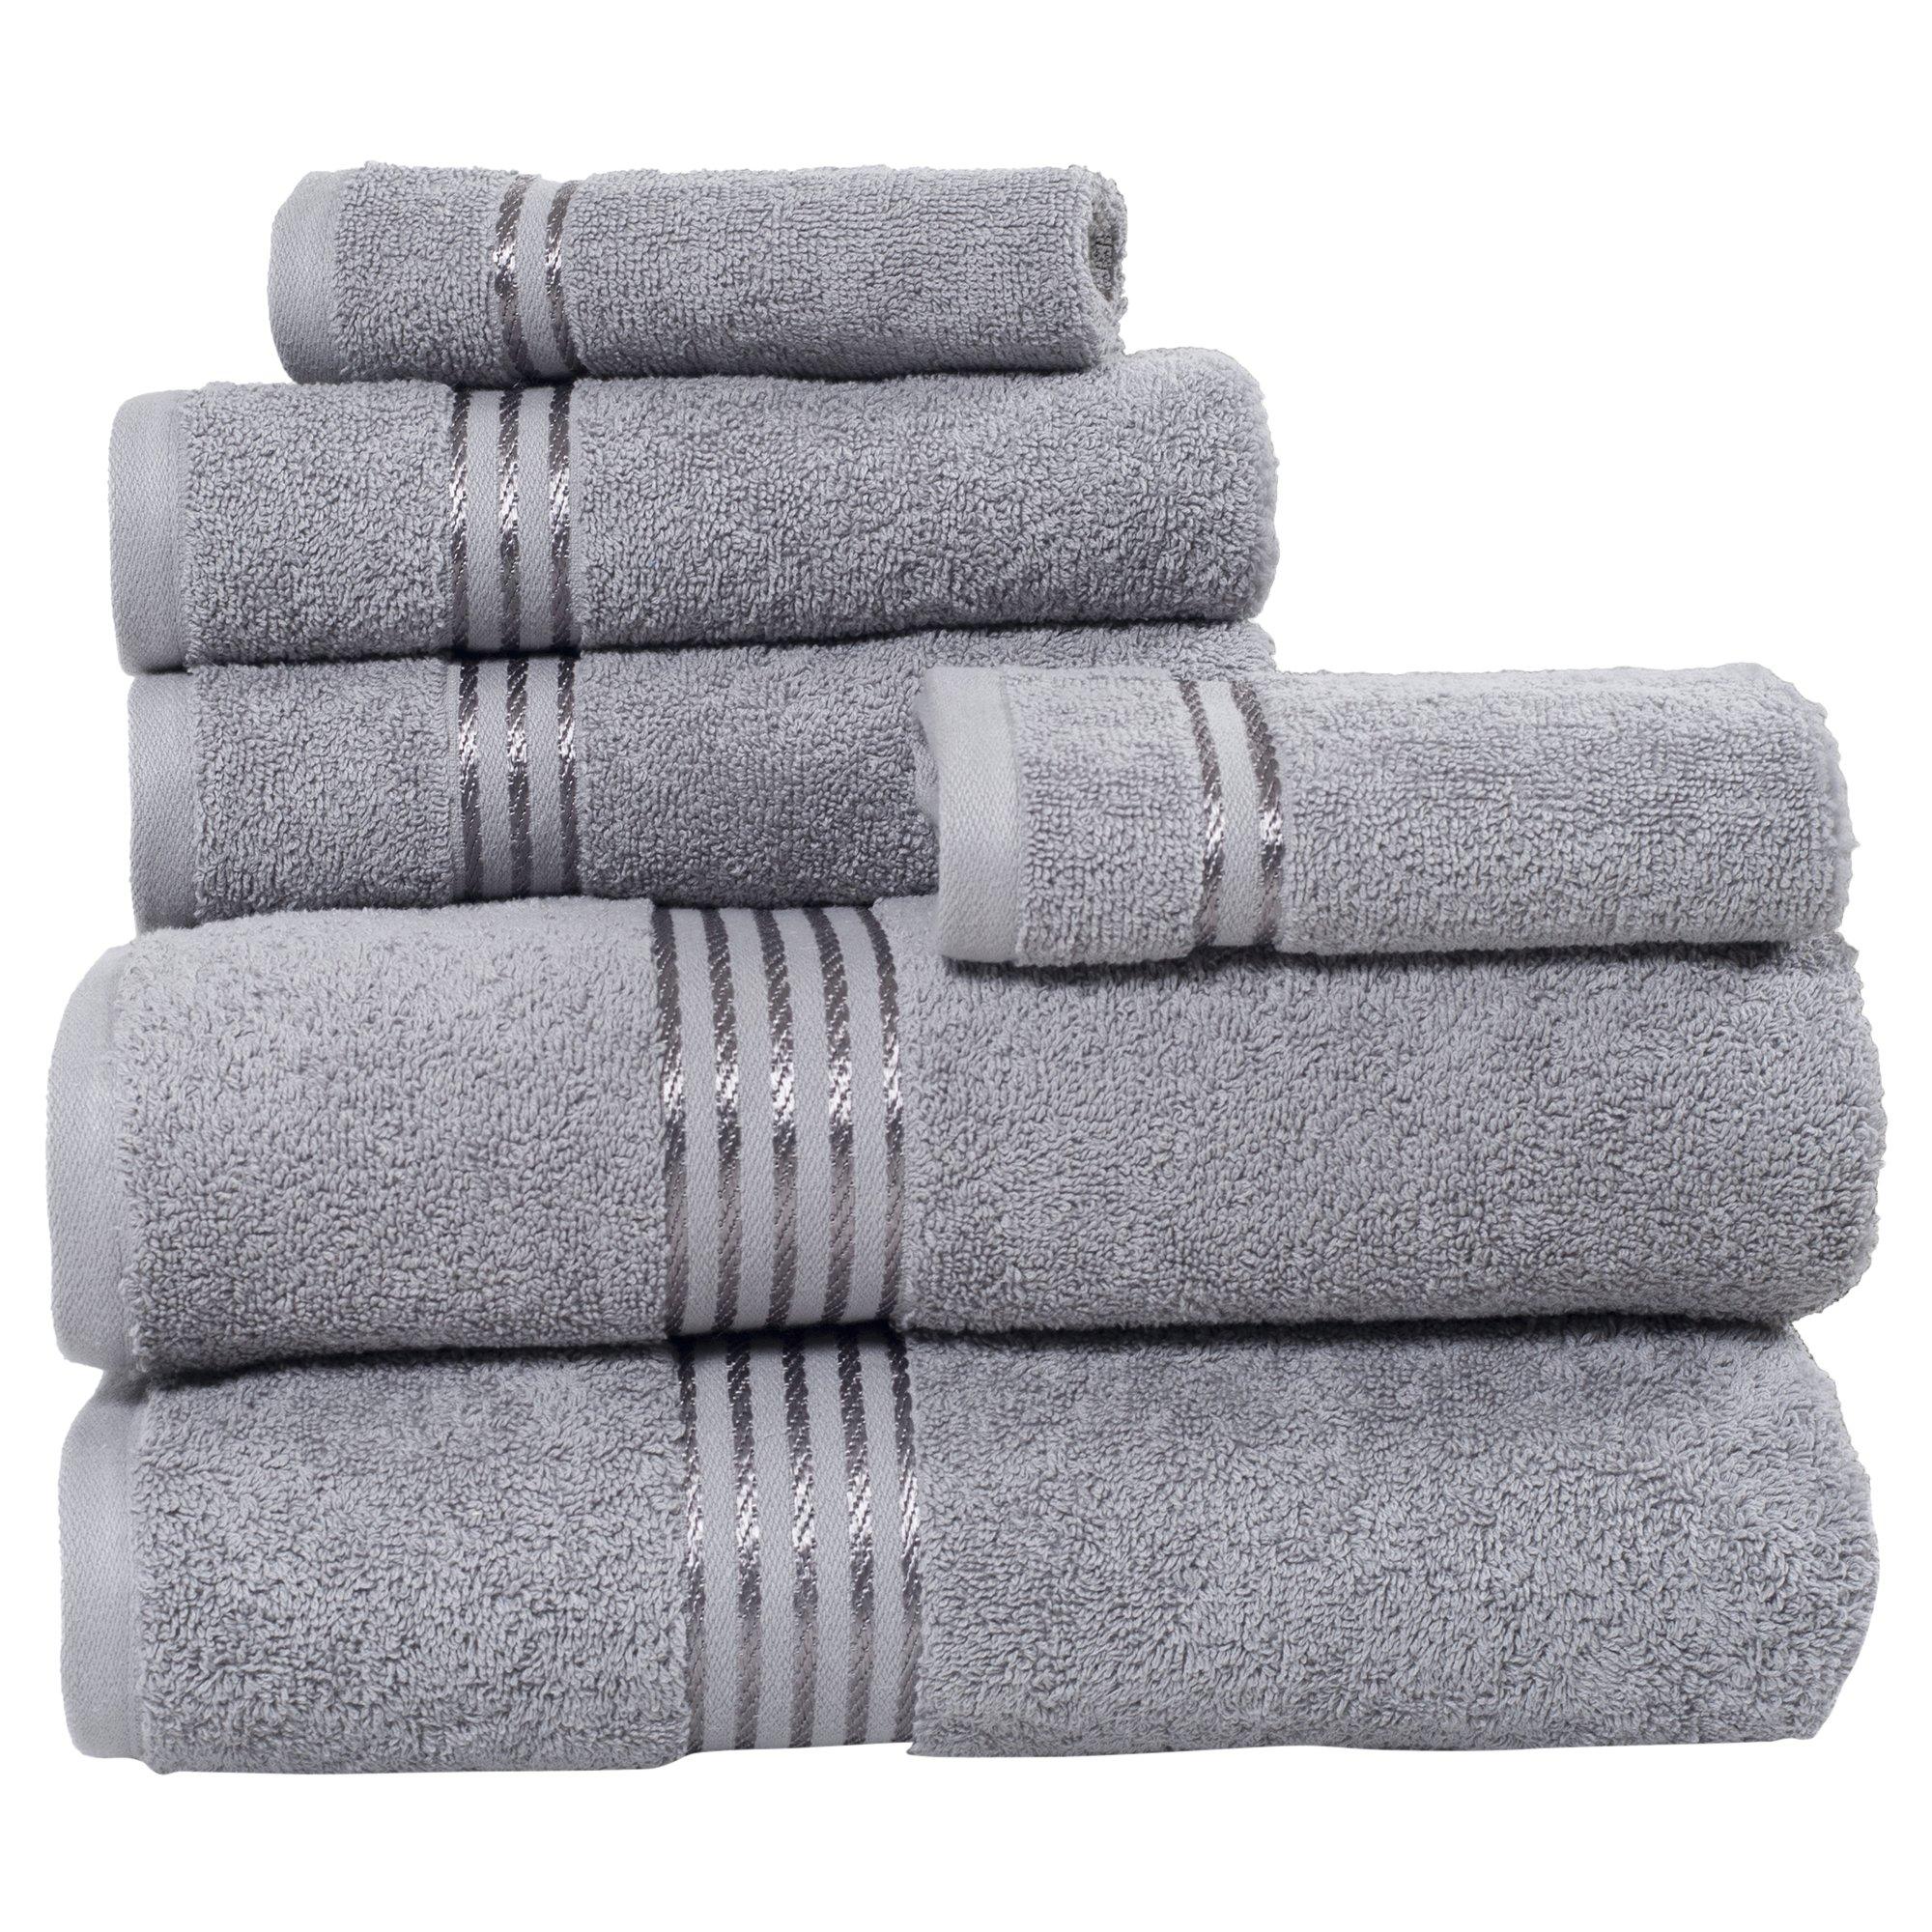 Lavish Home 100% Cotton Hotel 6 Piece Towel Set - Silver